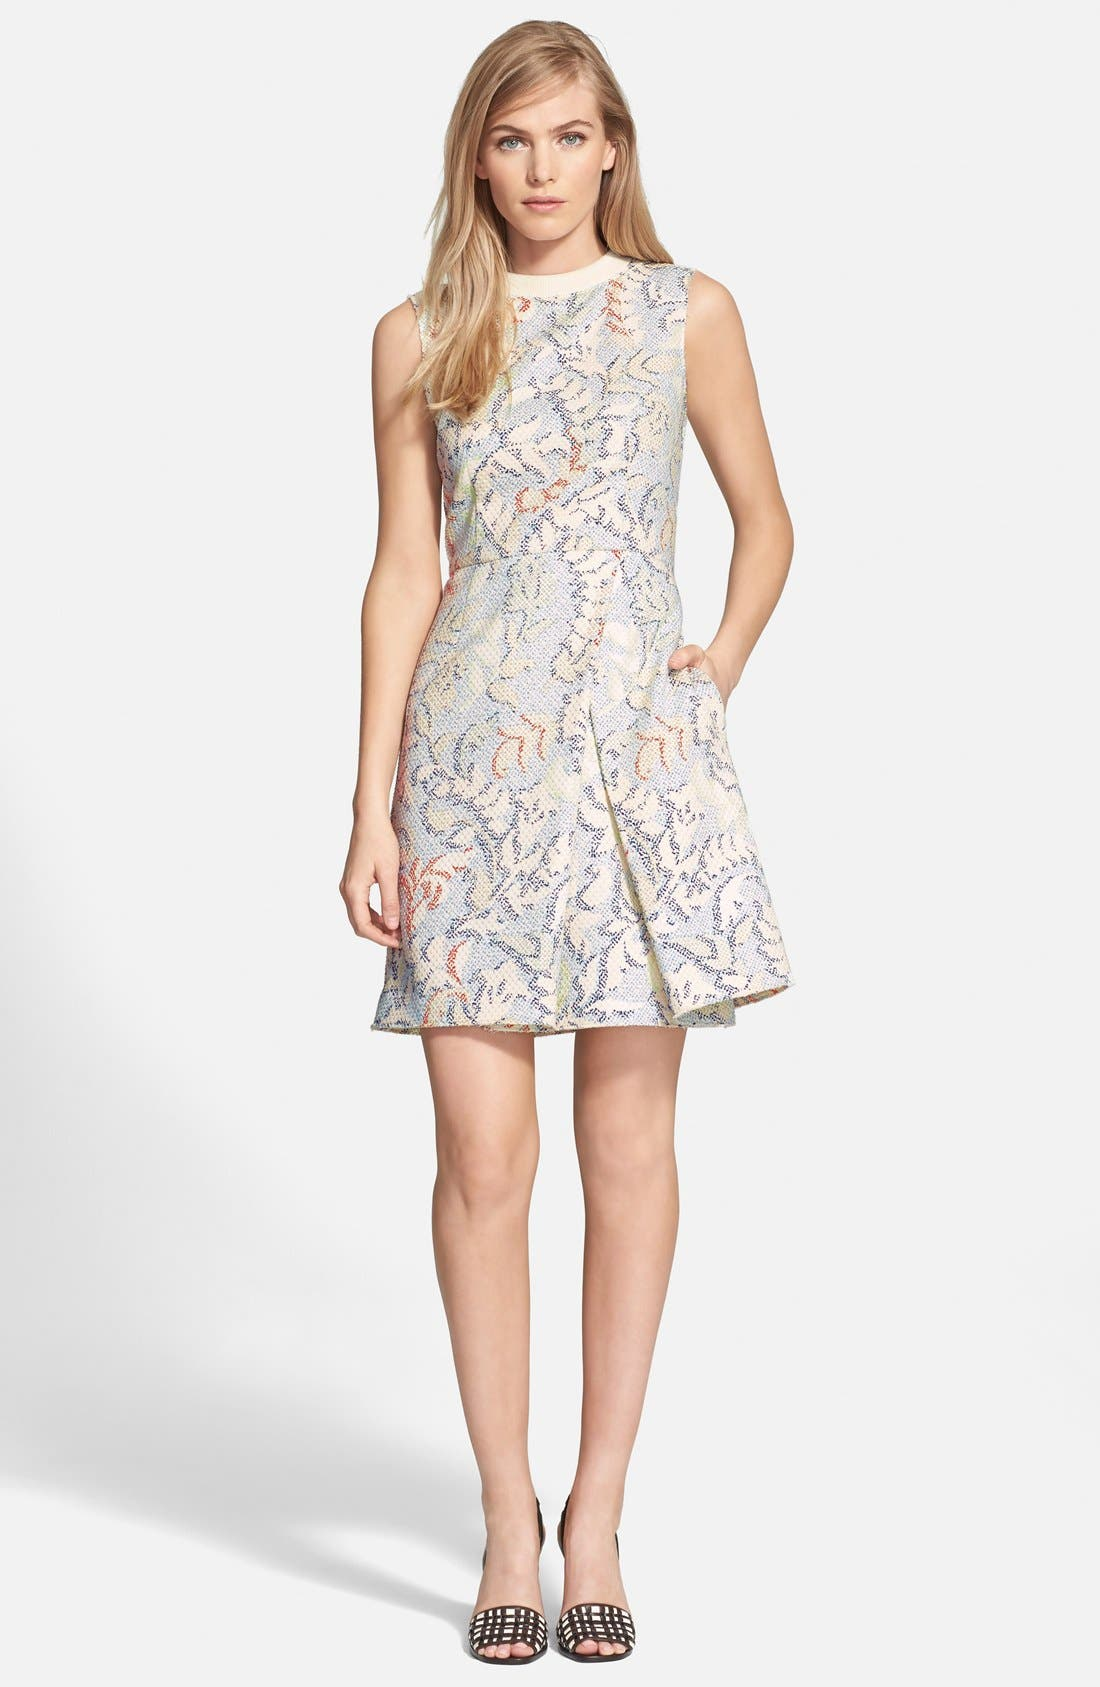 Main Image - Tory Burch Stretch Jacquard Fit & Flare Dress